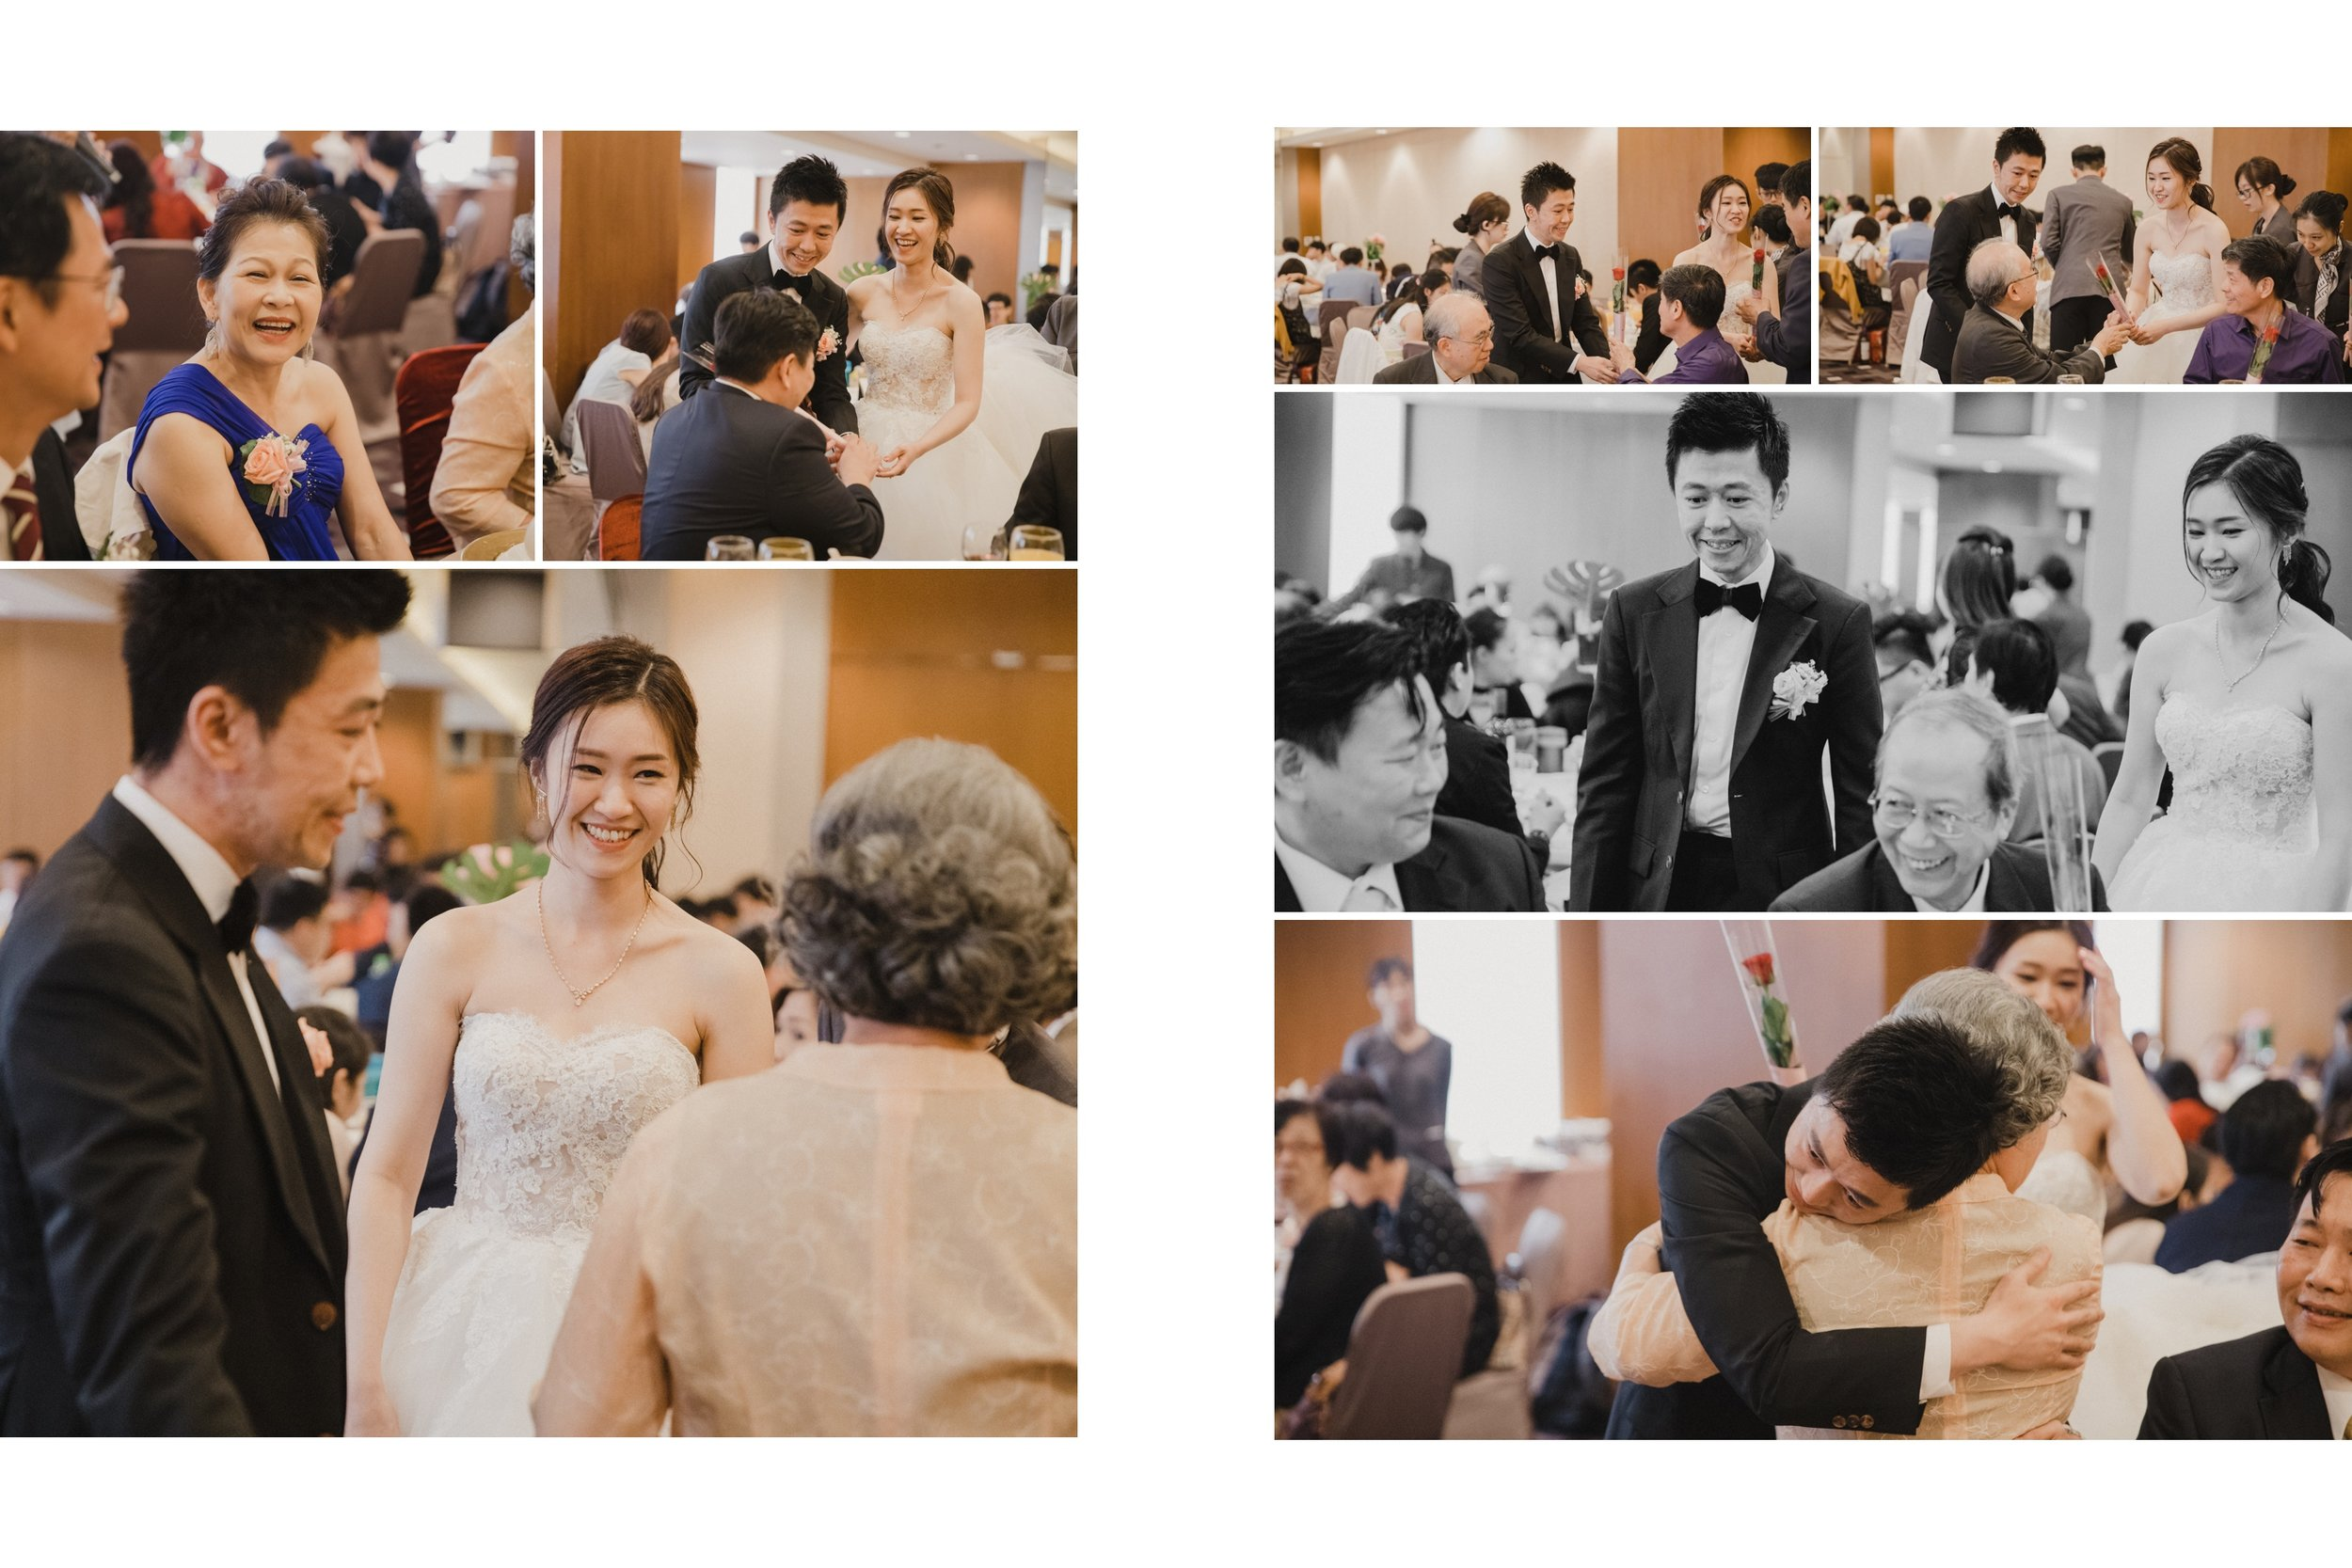 wedding-caridee-oscar-lunch-ambassador-hsinchu-結婚午宴-新竹國賓_105.jpg